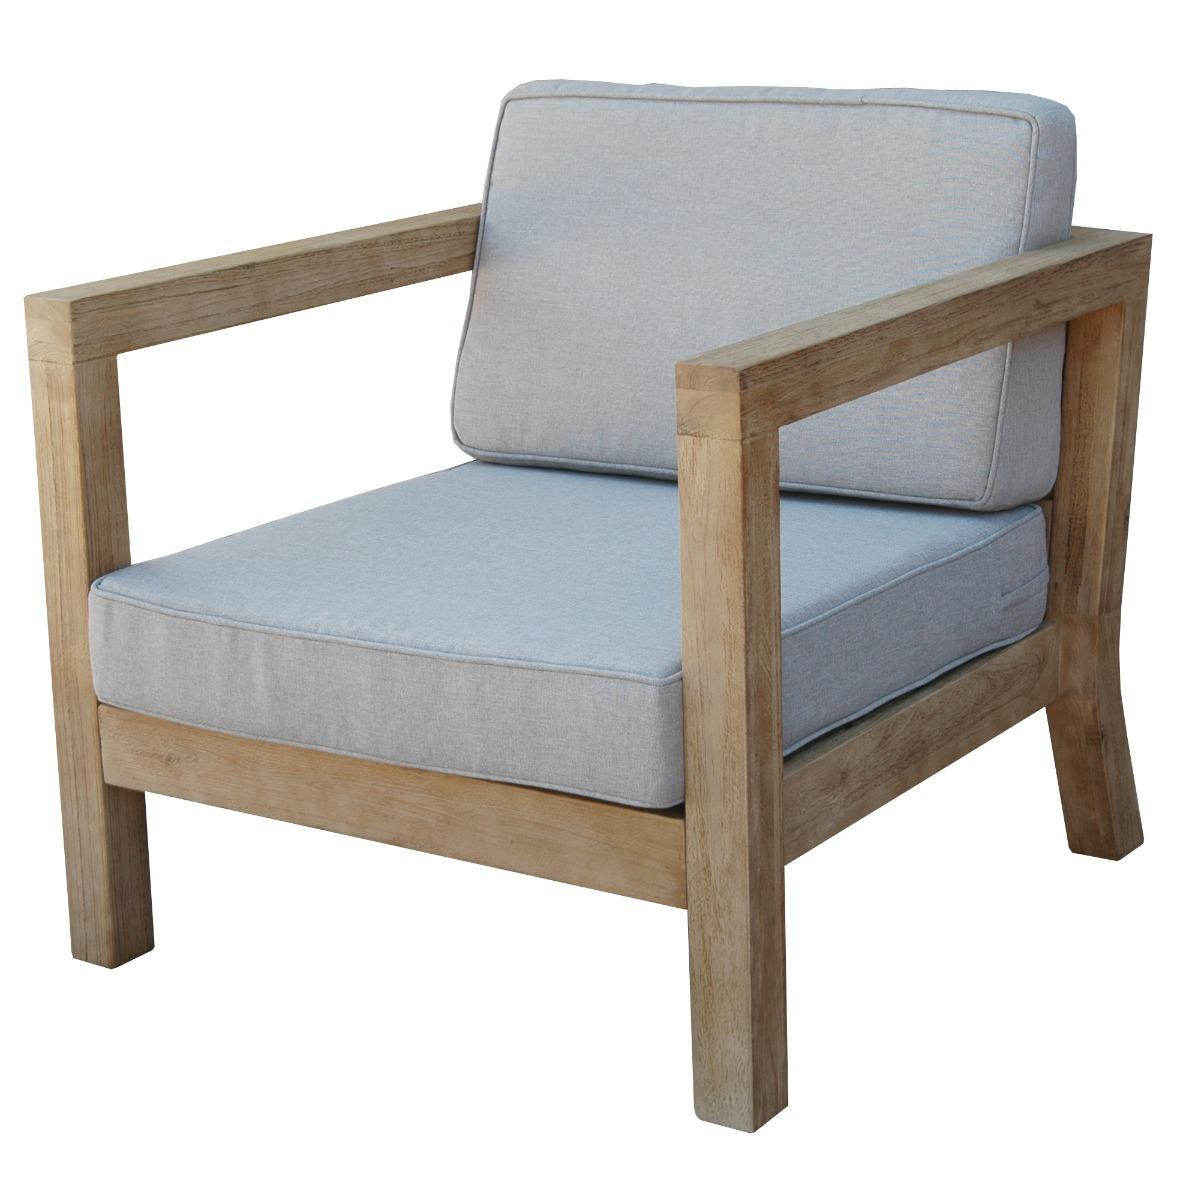 Korting Vlieland lounge chair